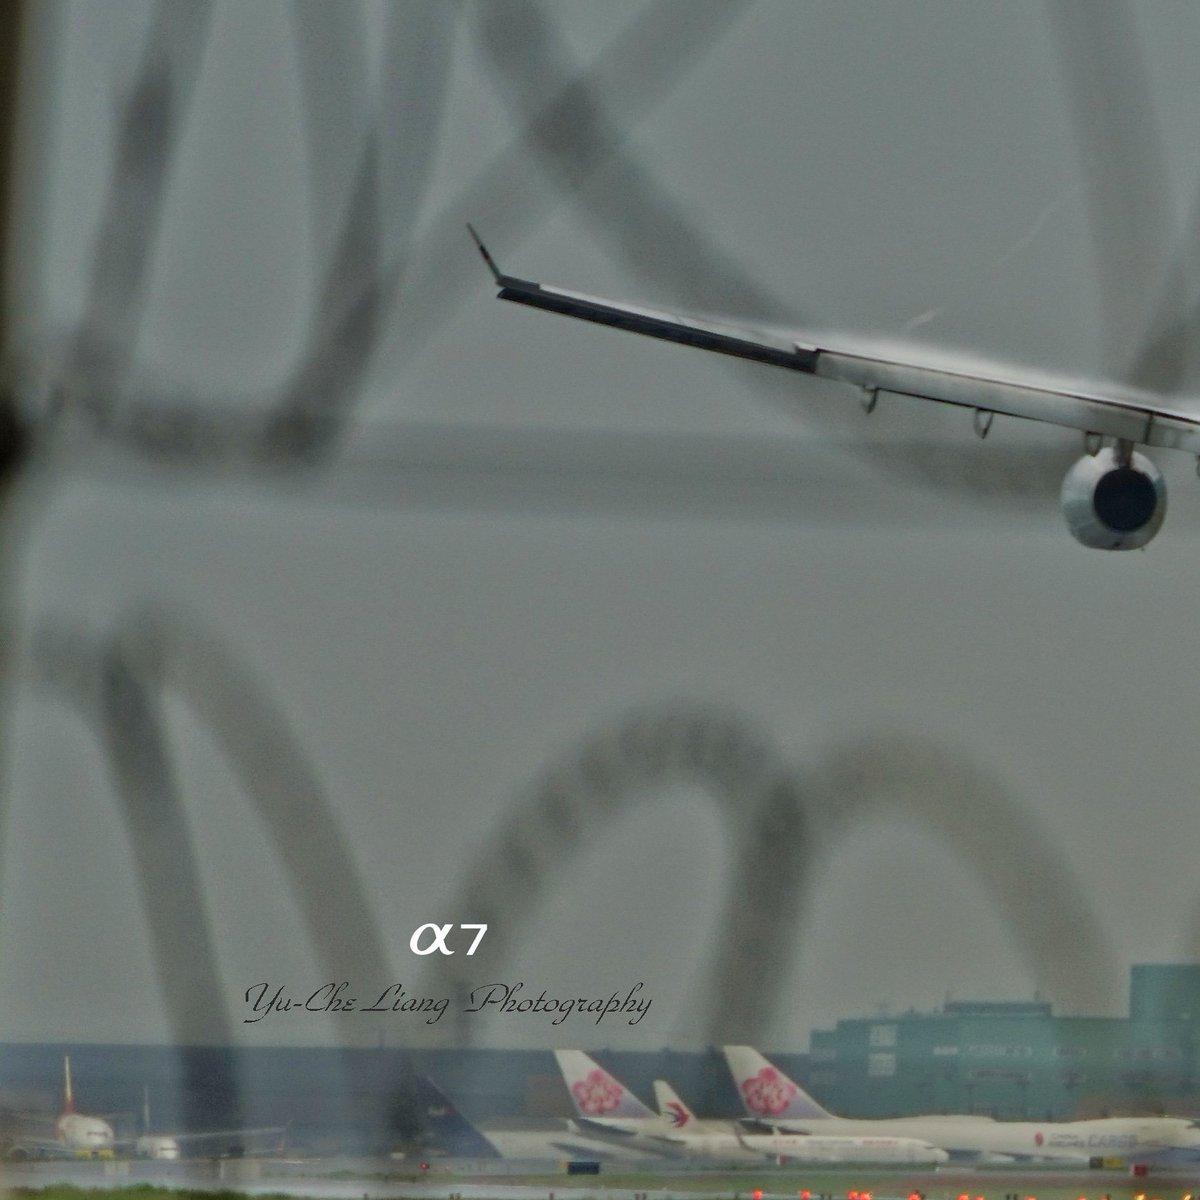 Cathay Pacific B-LBA  Airbus A330  #毎月27日はかなーみ部の日 #cathypacific #airbus #台湾 #飛行機大好き #飛行機好きな人と繋がりたい #飛行機倶楽部 #aviation  #av1ati0n #飛行機写真 #飛行機好きな人と繋がりたい #α7 #写真撮ってる人と繋がりたい  #写真好きな人と繋がりたい #sonyimagespic.twitter.com/tpoVI0h3QC